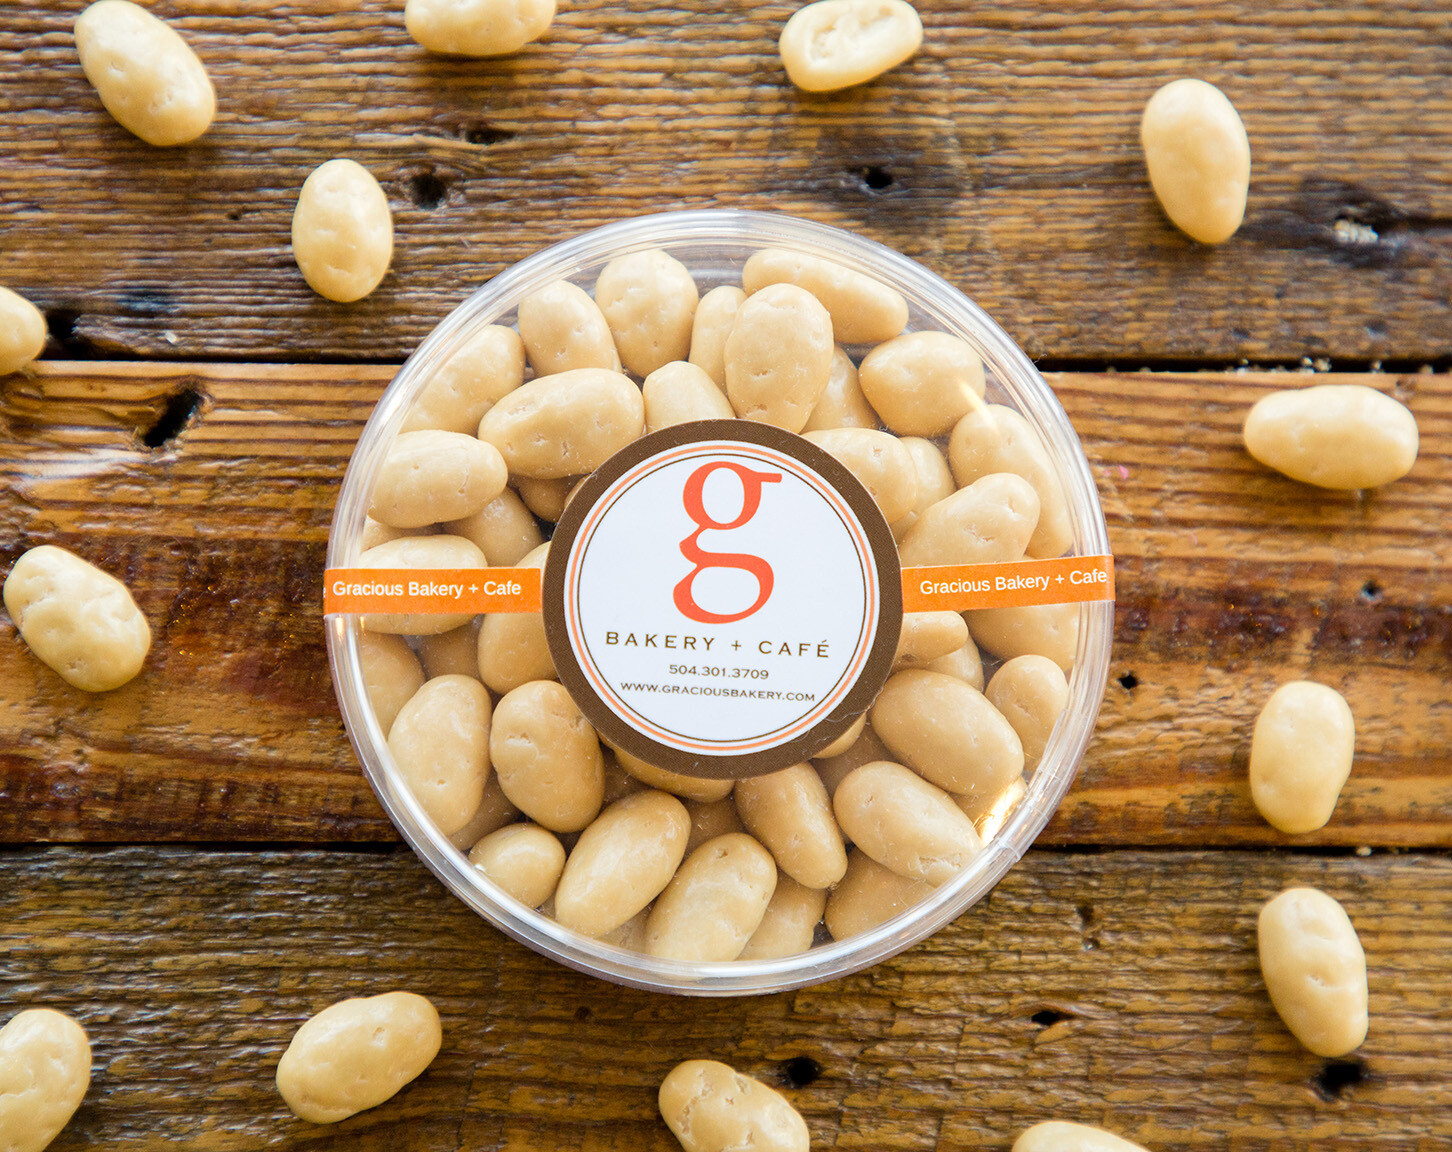 Passionfruit Almonds